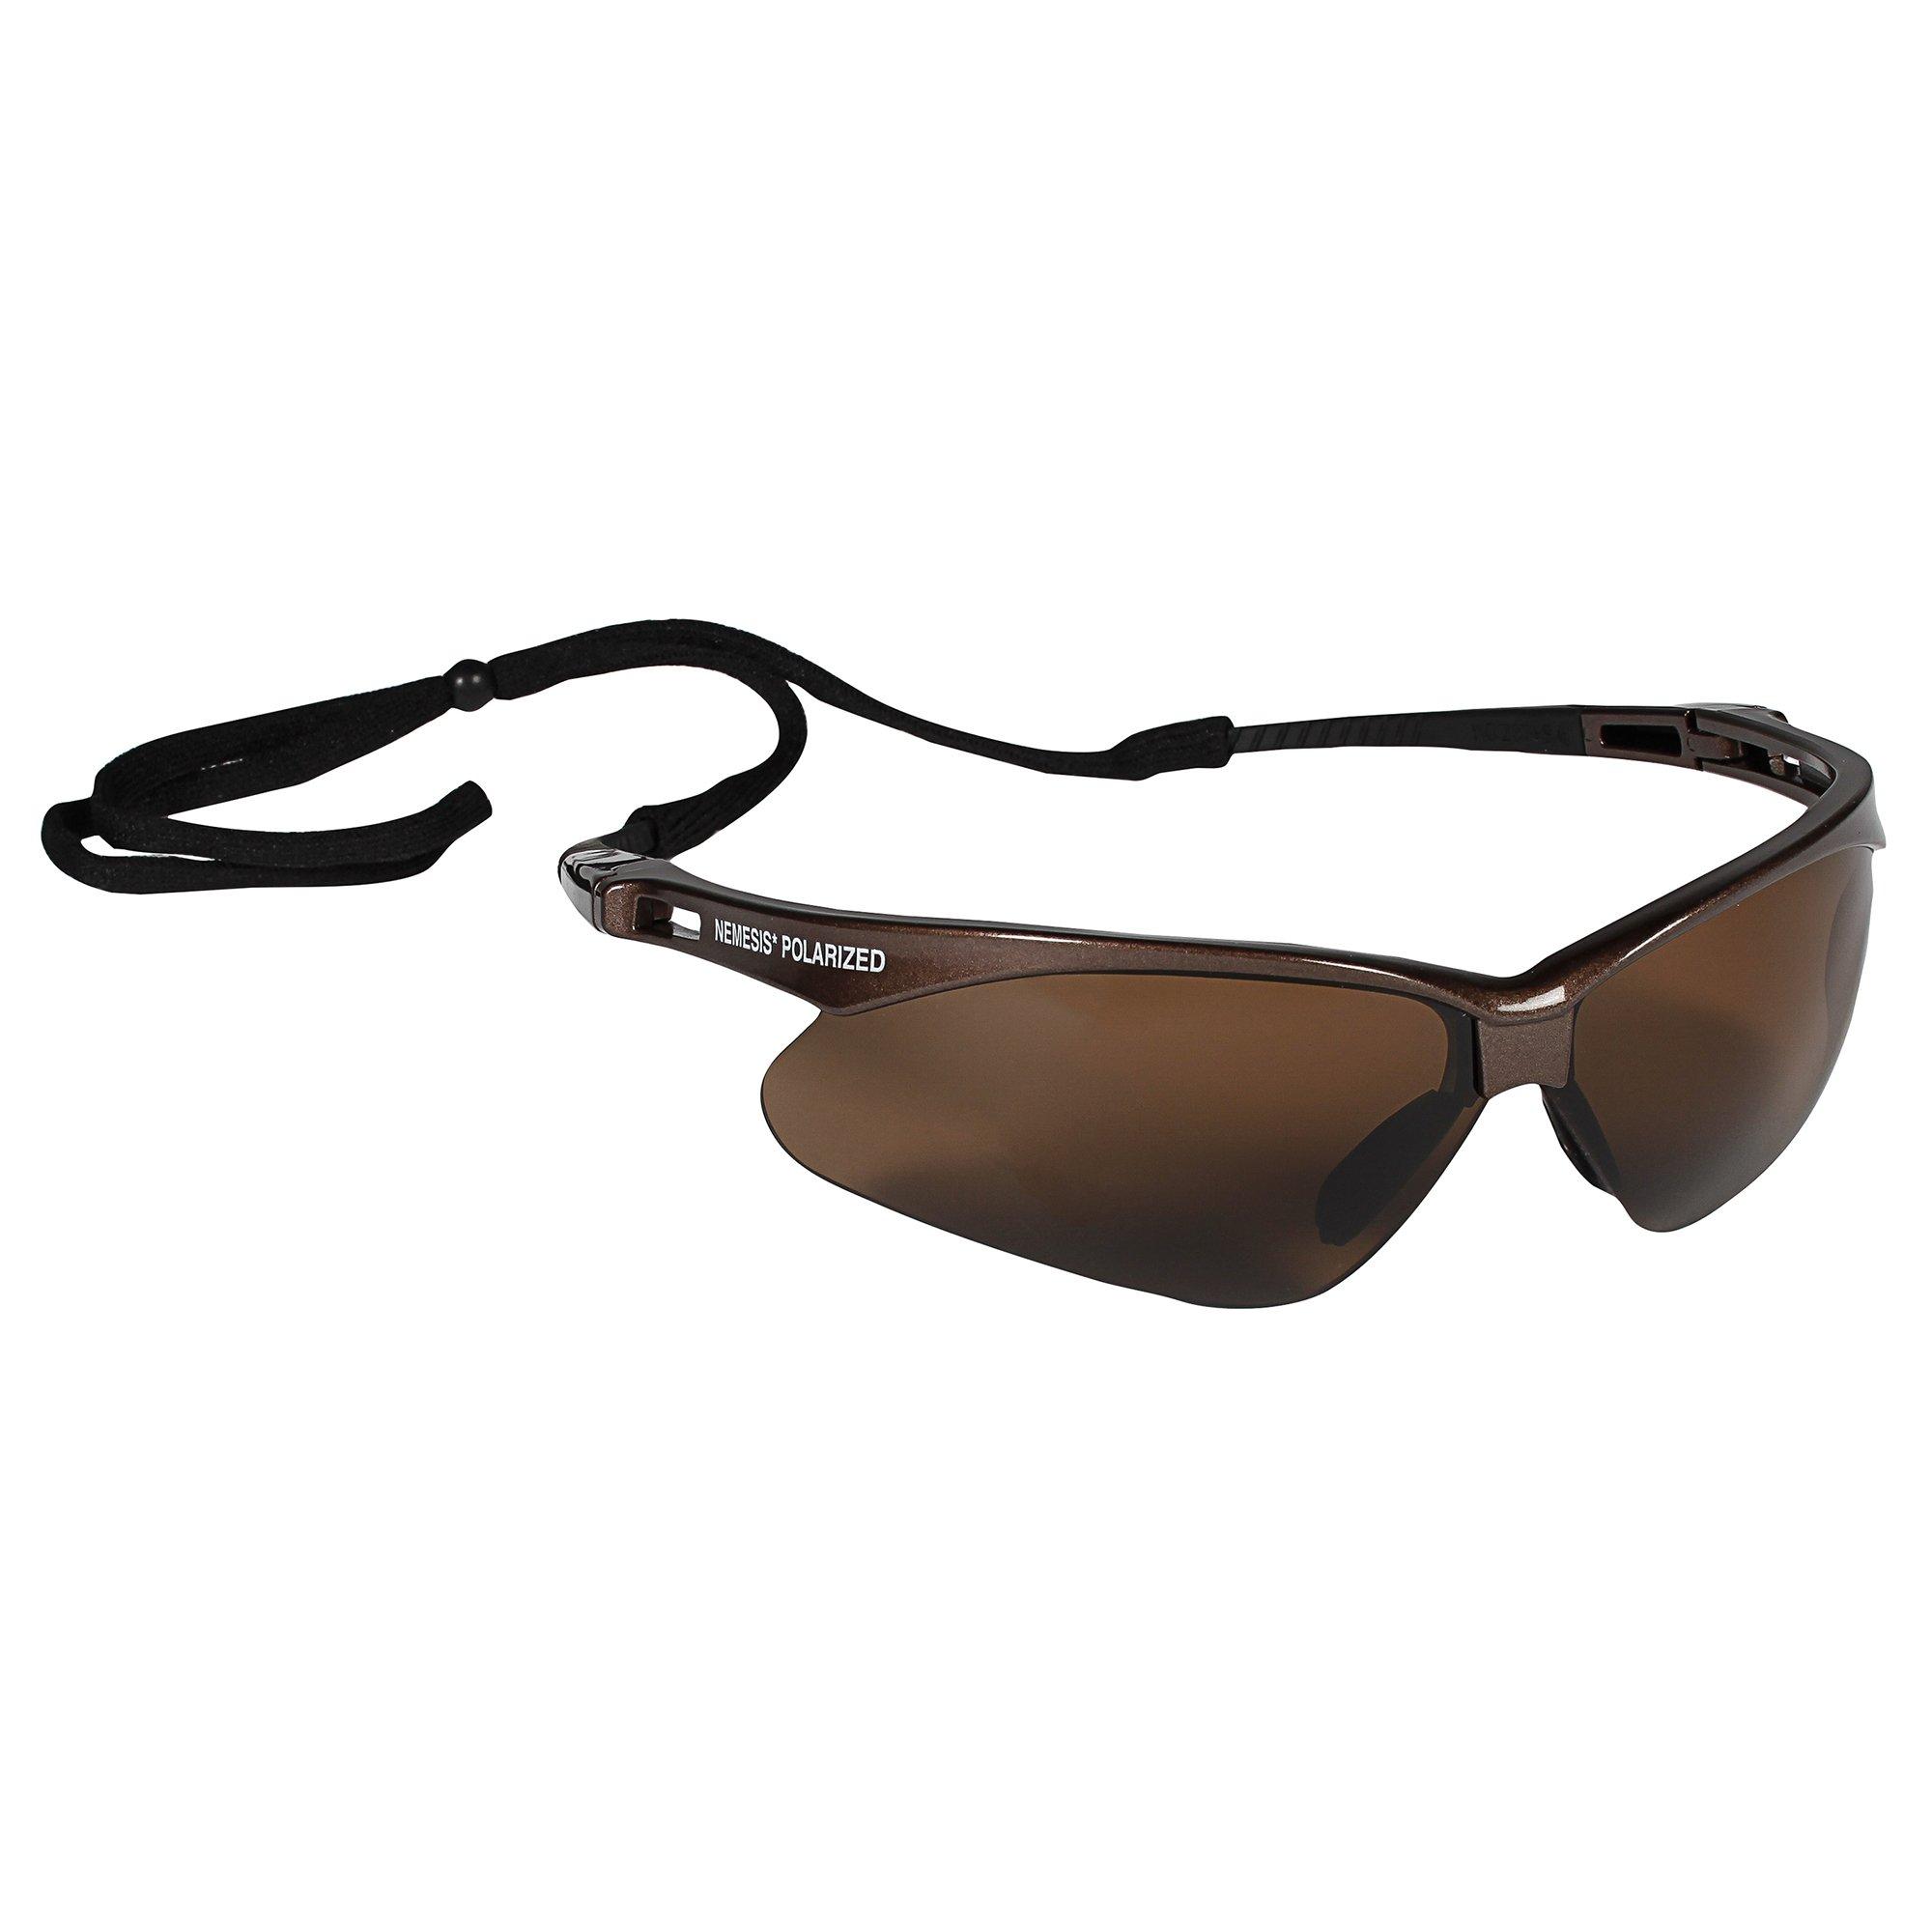 Jackson Safety V30 Nemesis Polarized Safety Glasses (28637), Polarized Brown Lenses, Brown Frame by Jackson Safety